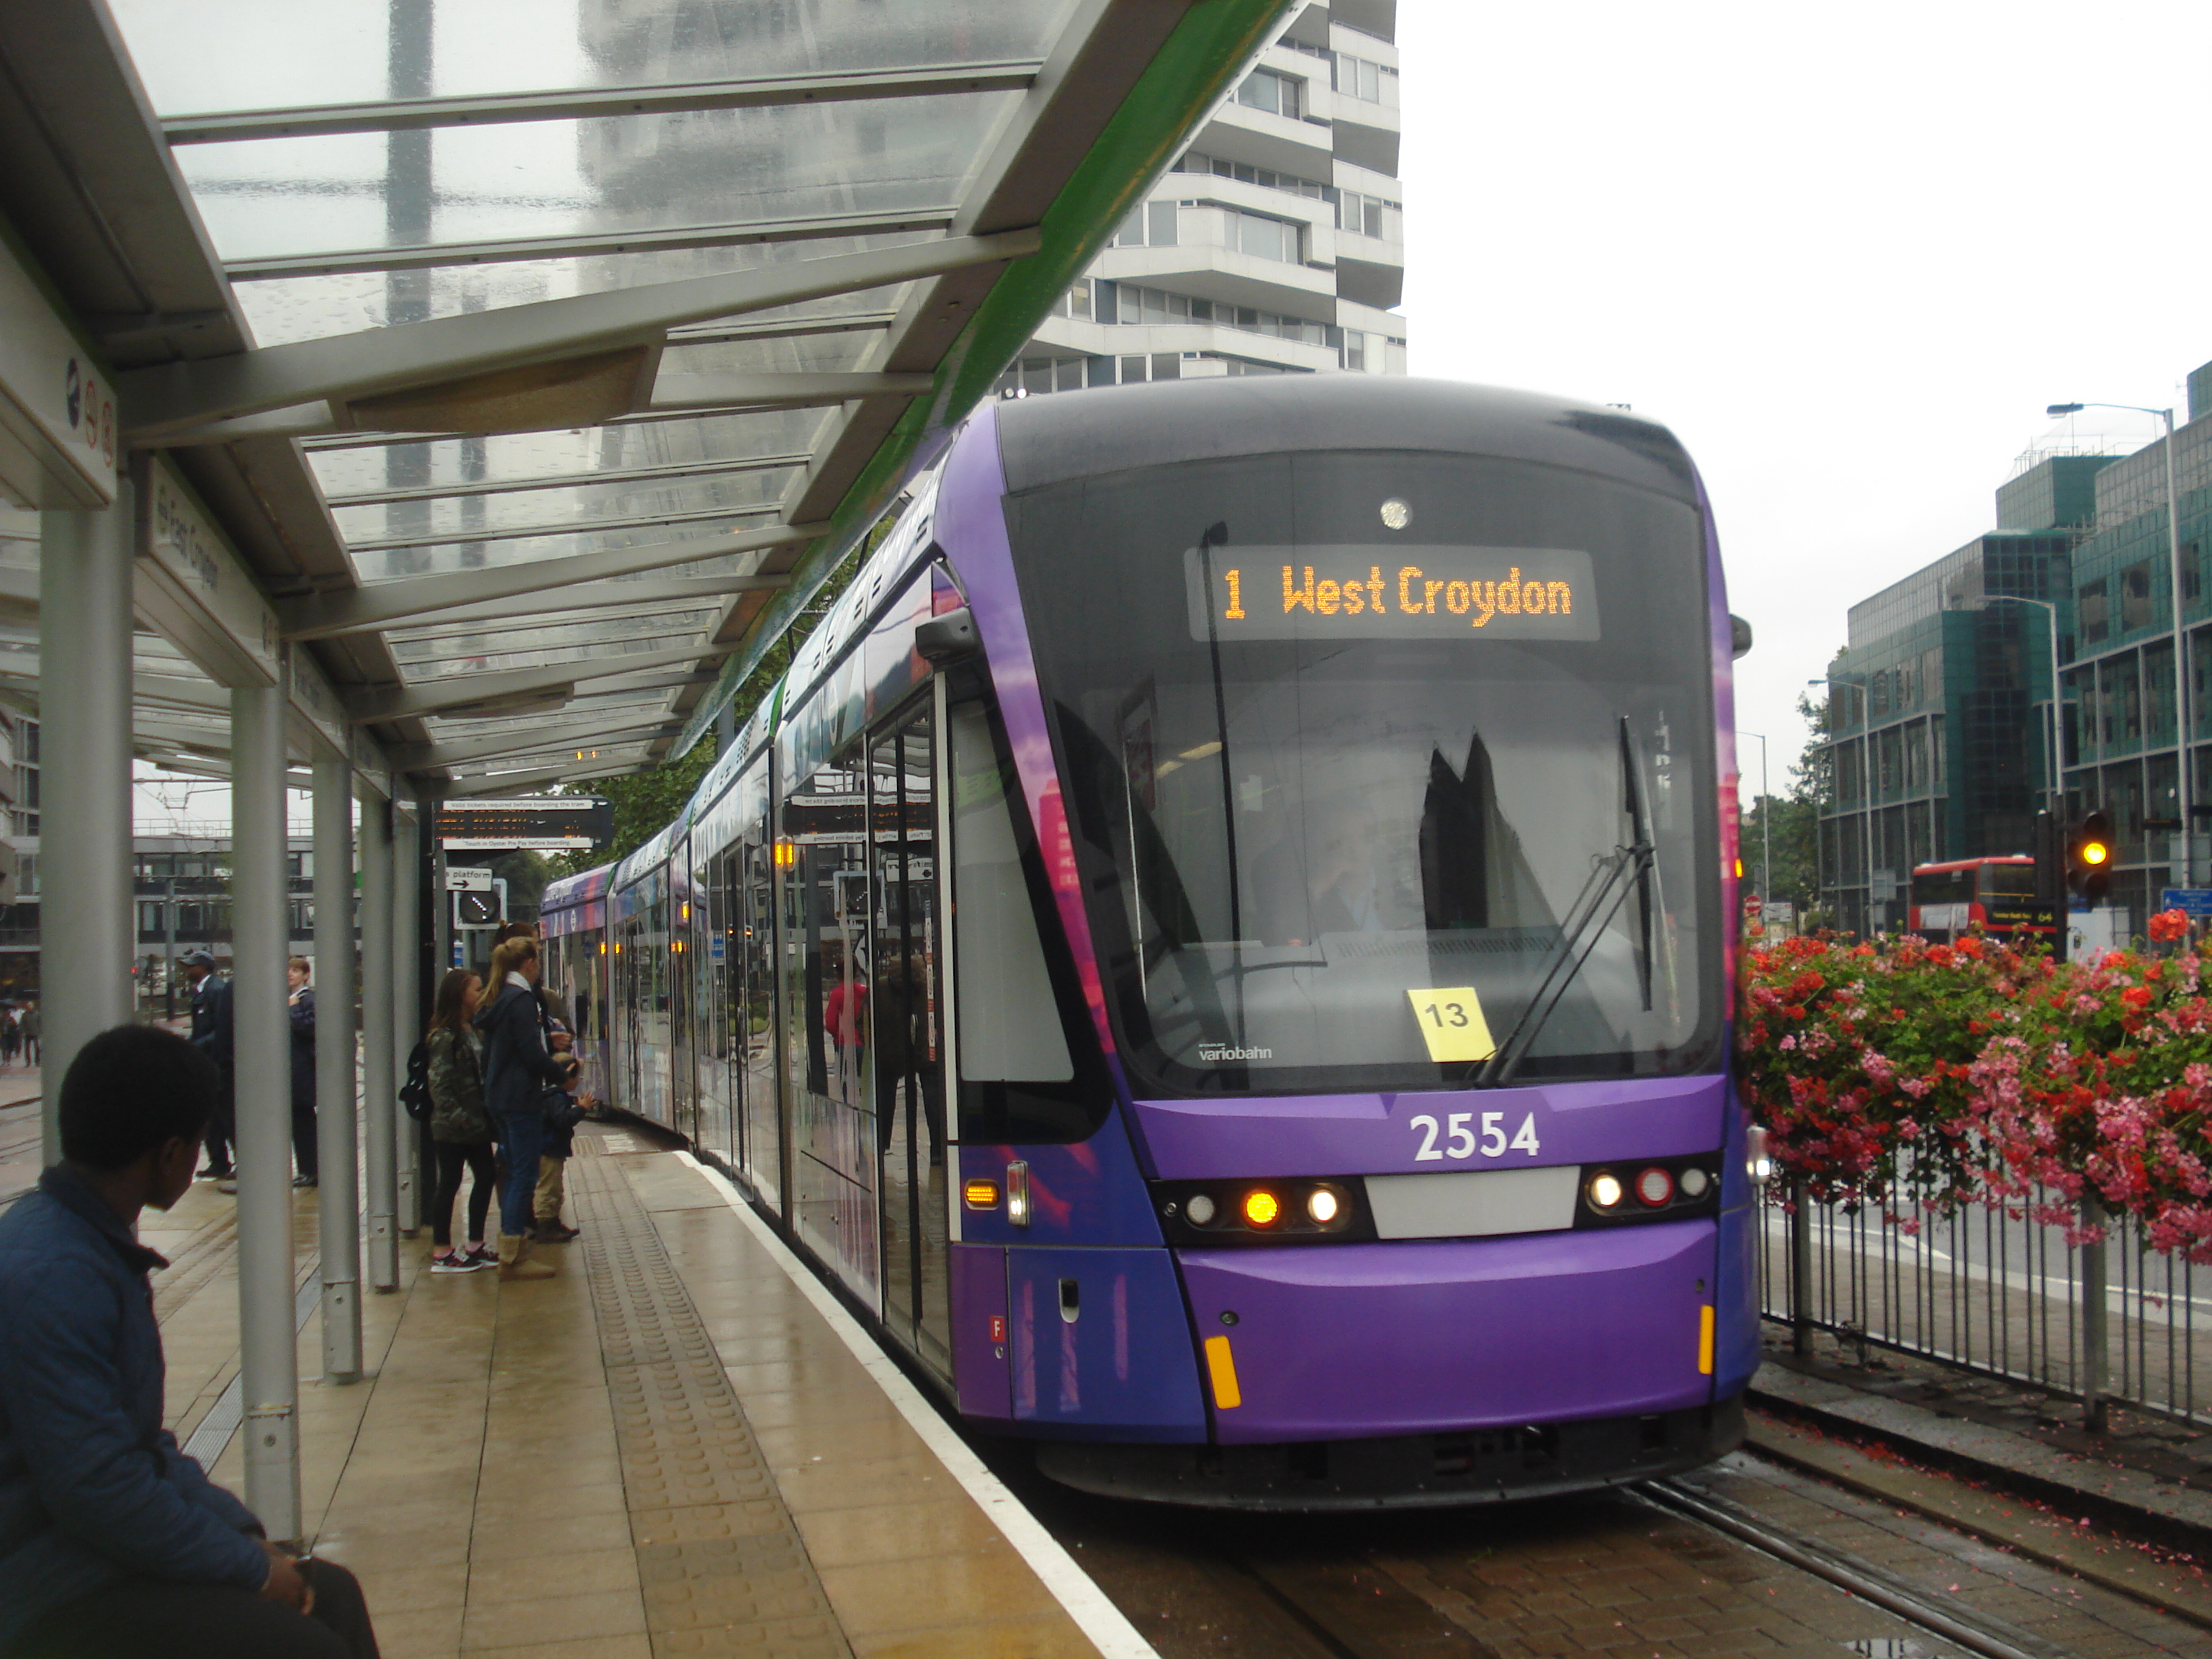 File:Au Morandarte Flickr Tramlink 2554 on Route 1, East Croydon  (9756278844)